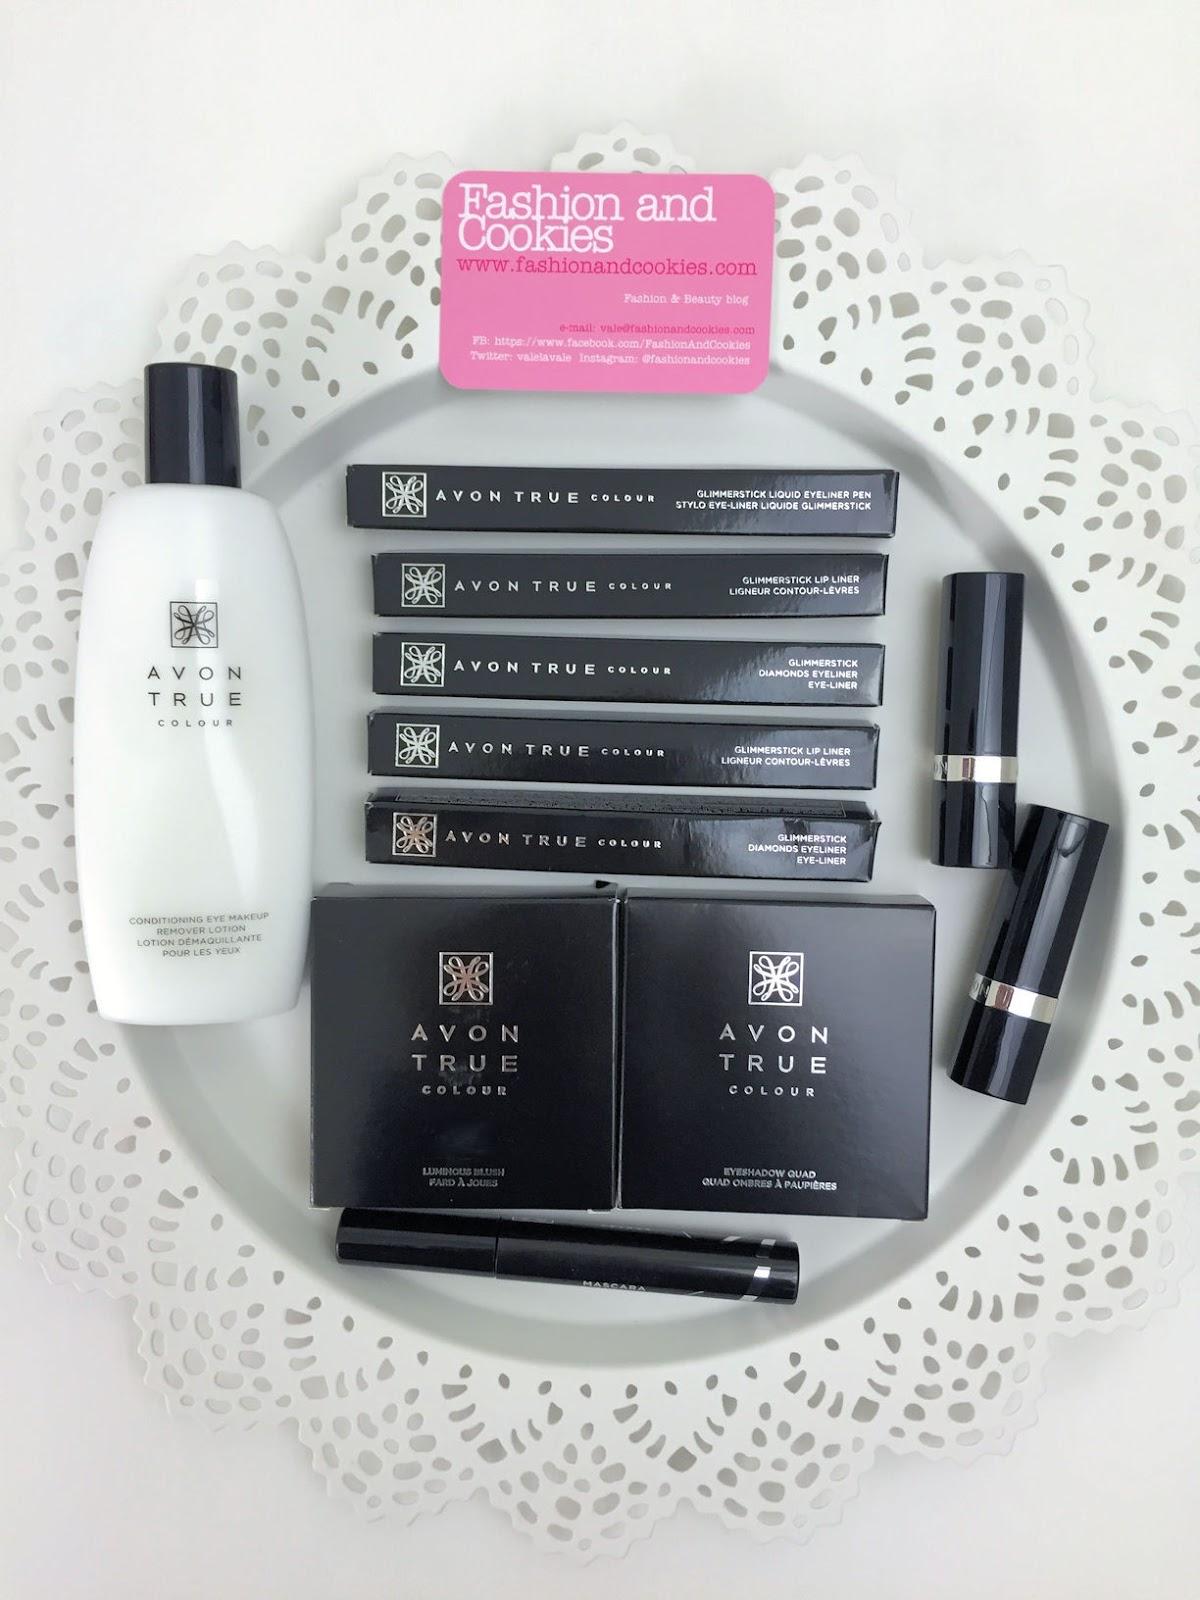 Avon #allascopertadiavon collezione makeup True Colour su Fashion and Cookies beauty blog, beauty blogger